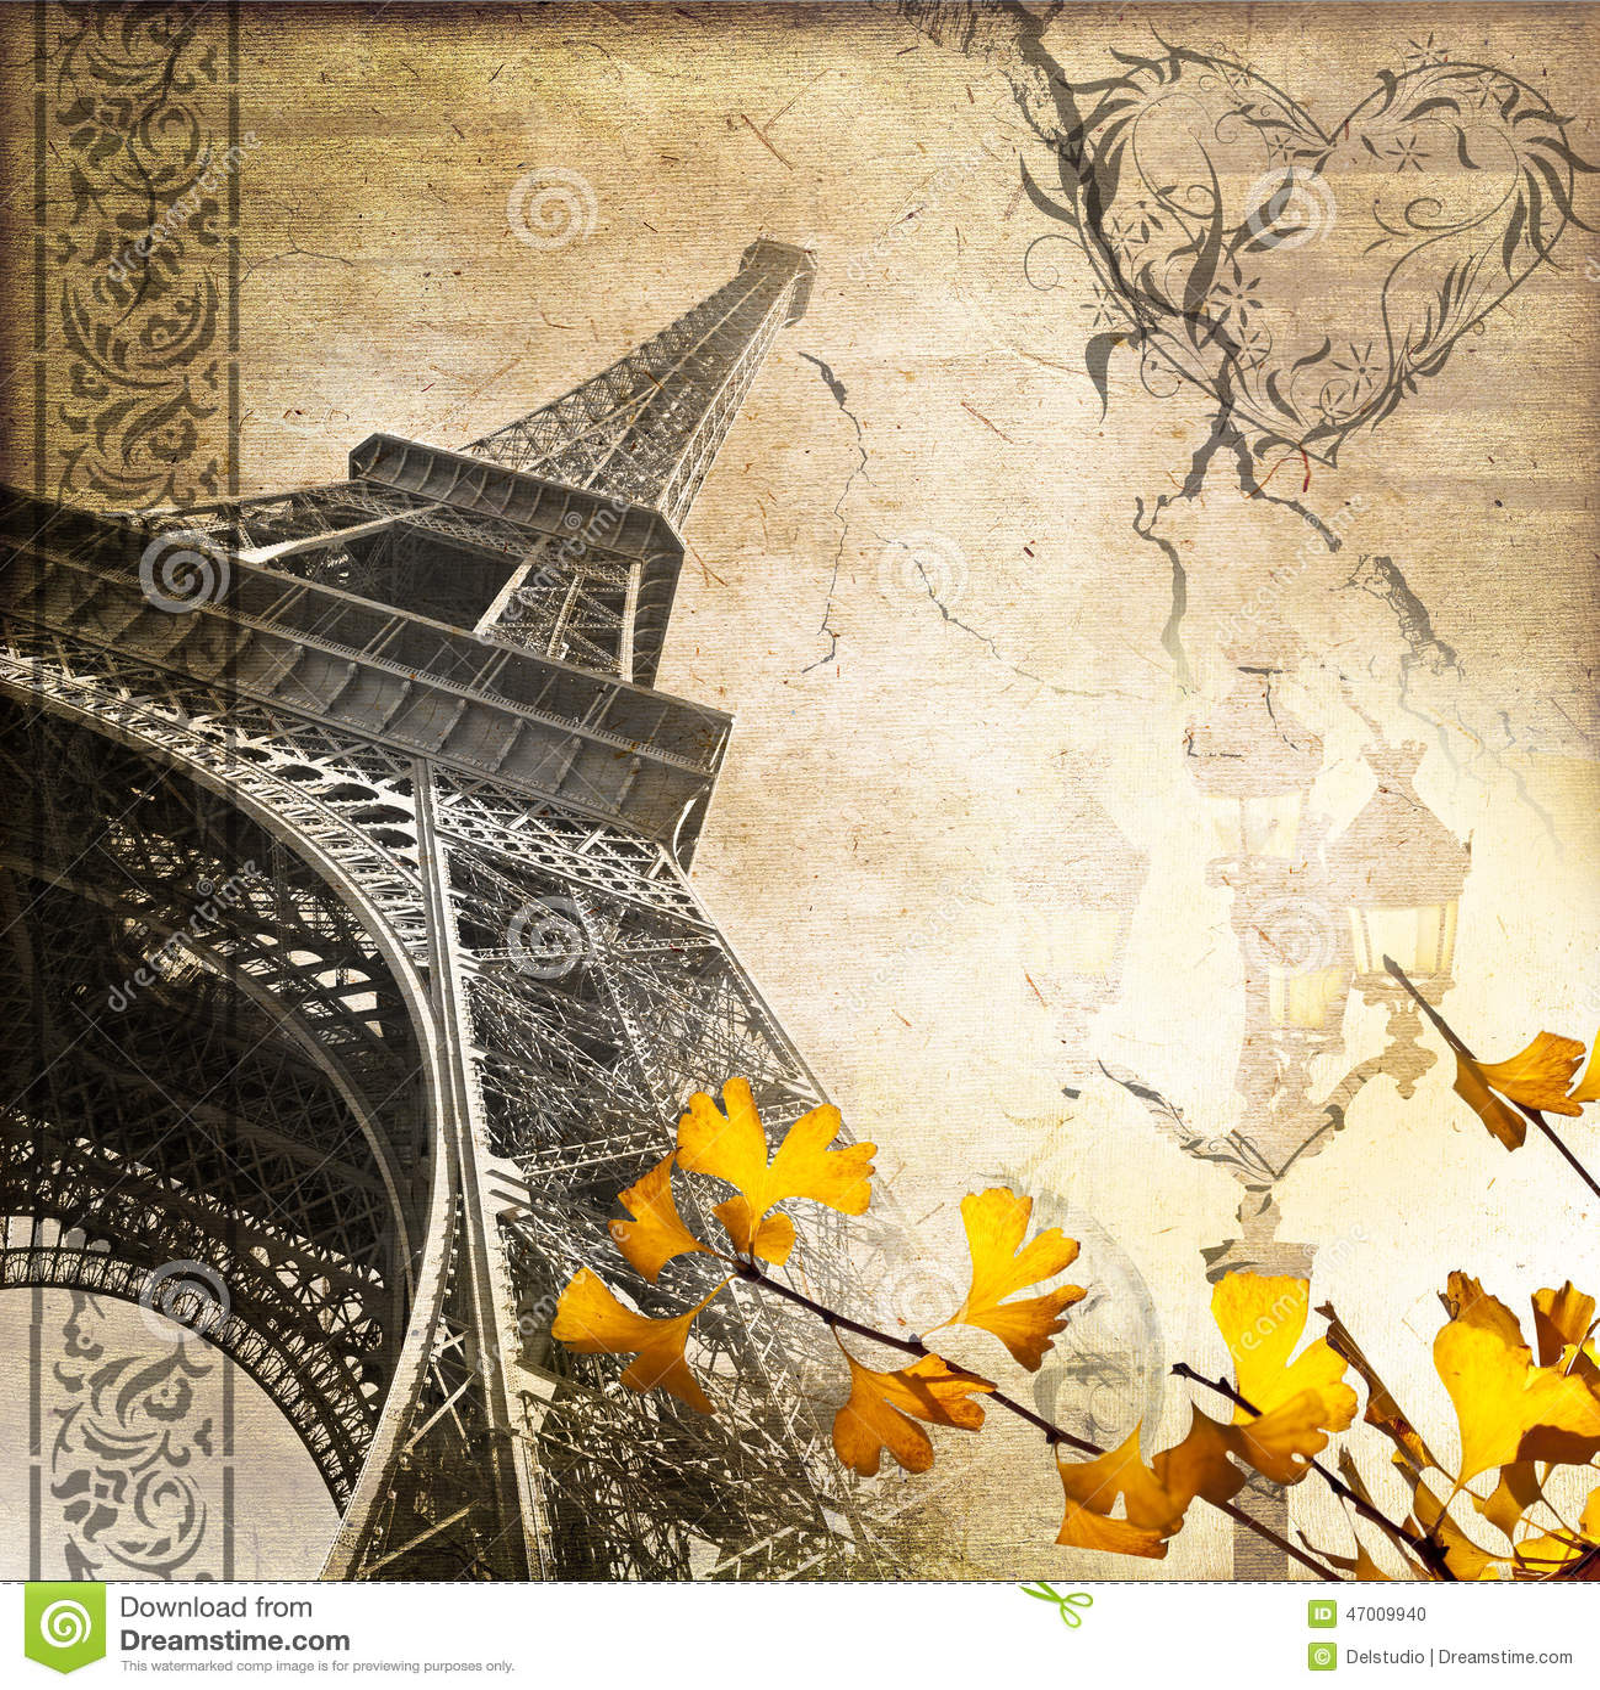 ... Vintage Paris Collage Eiffel Tower Stock Photo - Image: 47009940